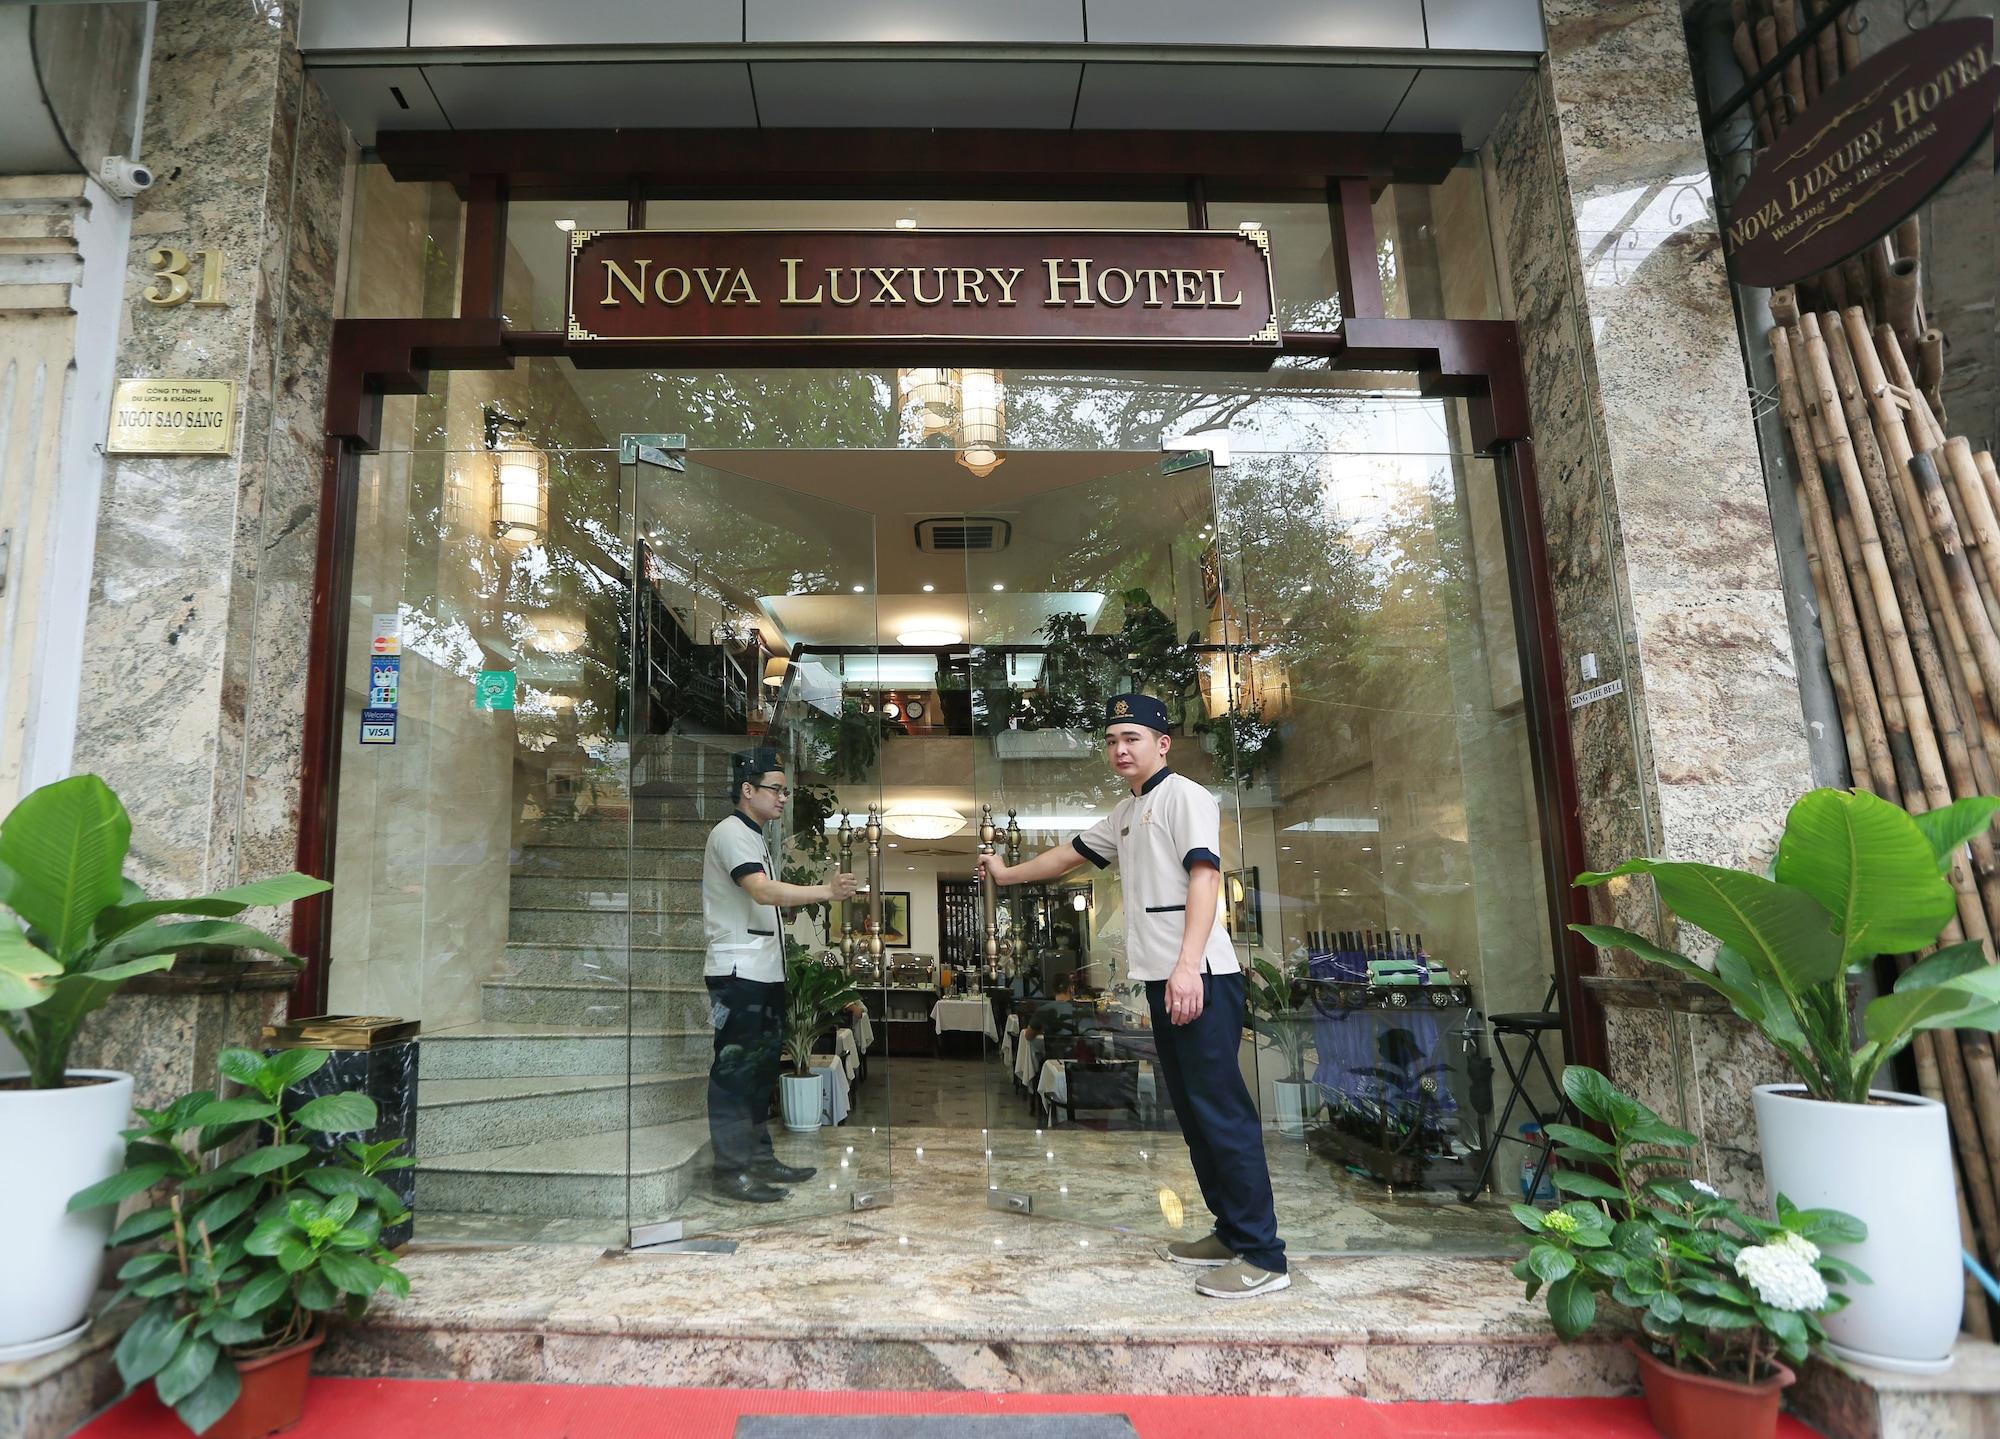 Nova Luxury Hotel, Hoàn Kiếm